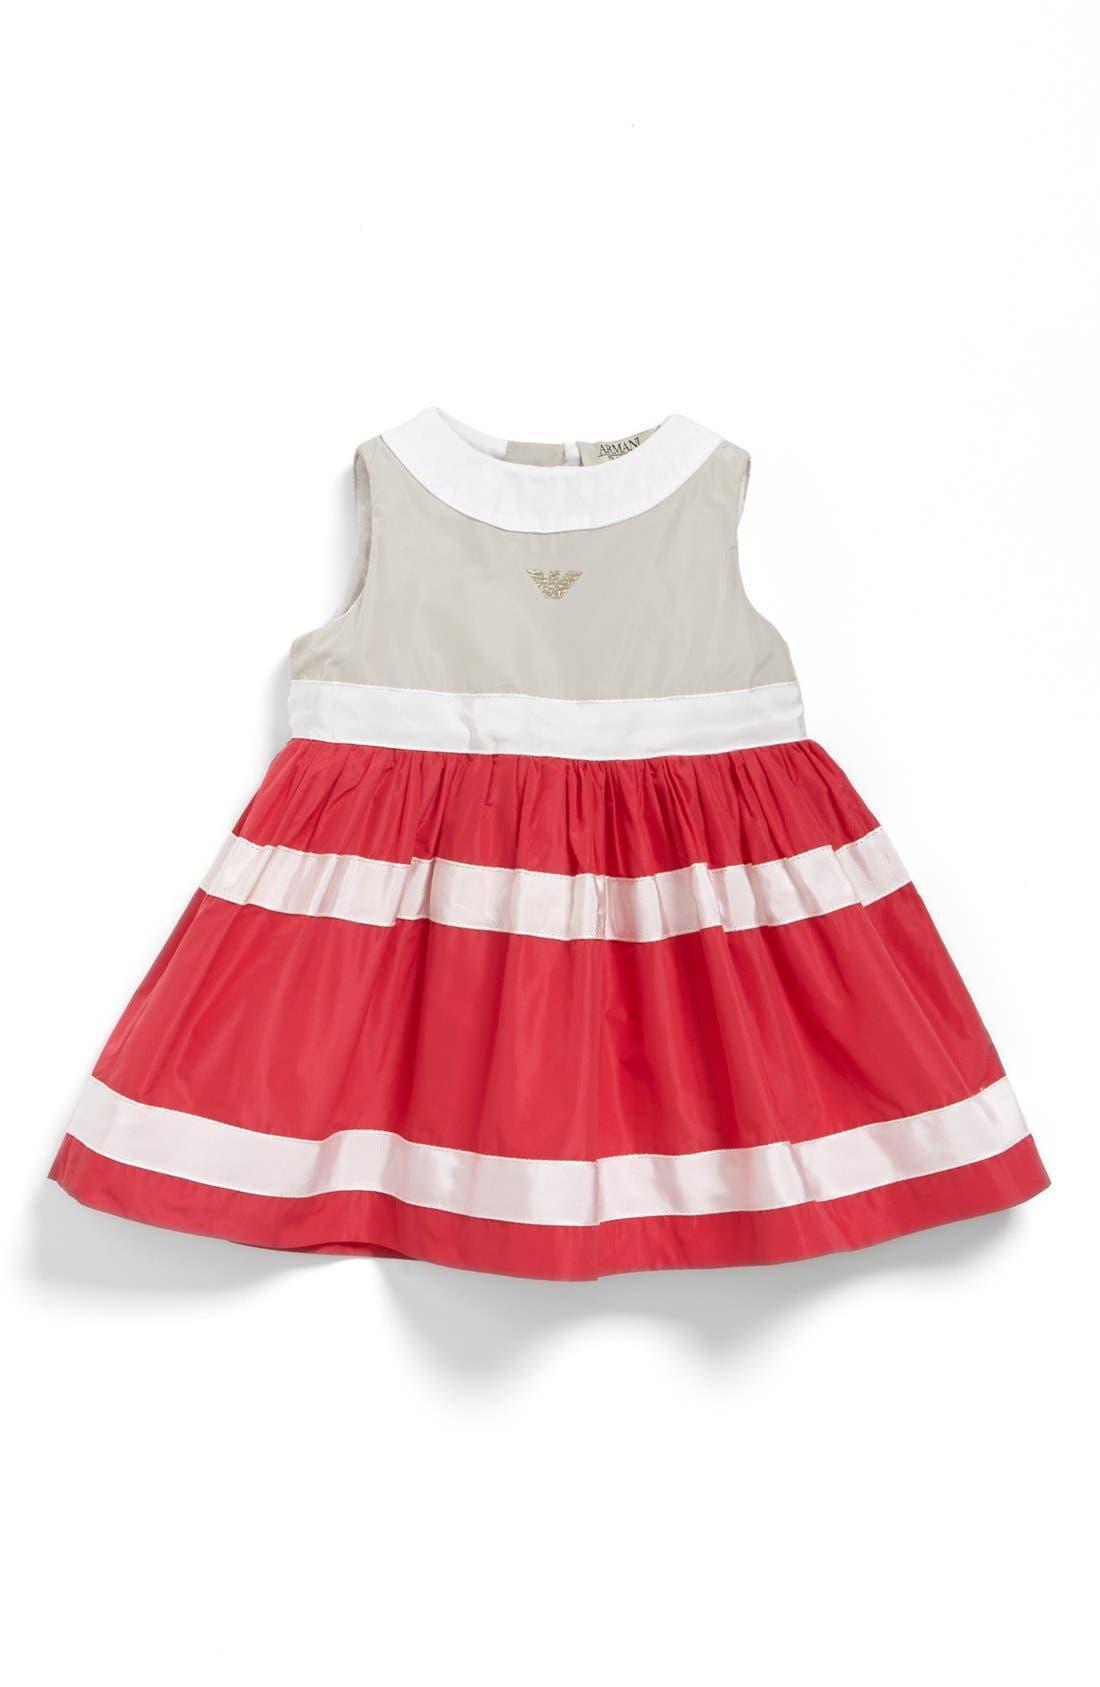 Alternate Image 1 Selected - Armani Junior Stripe Taffeta Dress (Baby Girls)